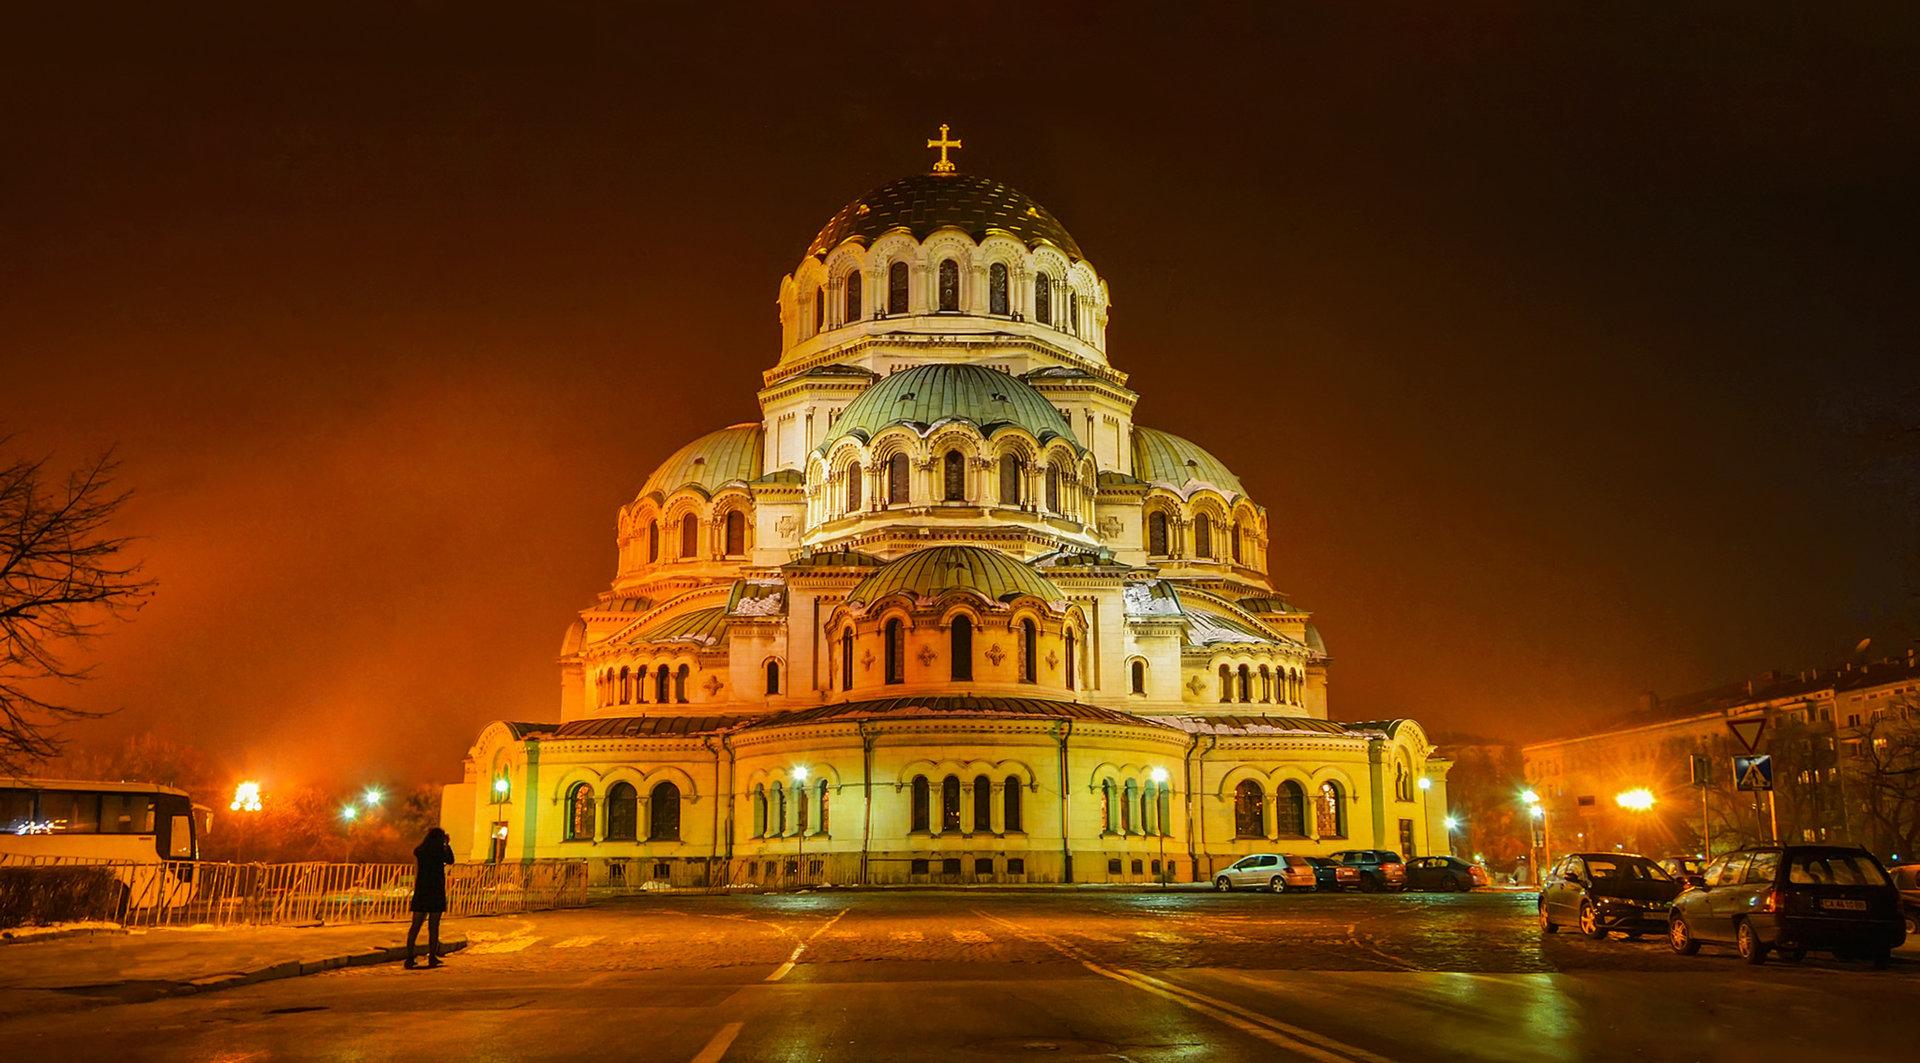 Александър Невски | Author dorascal18 | PHOTO FORUM